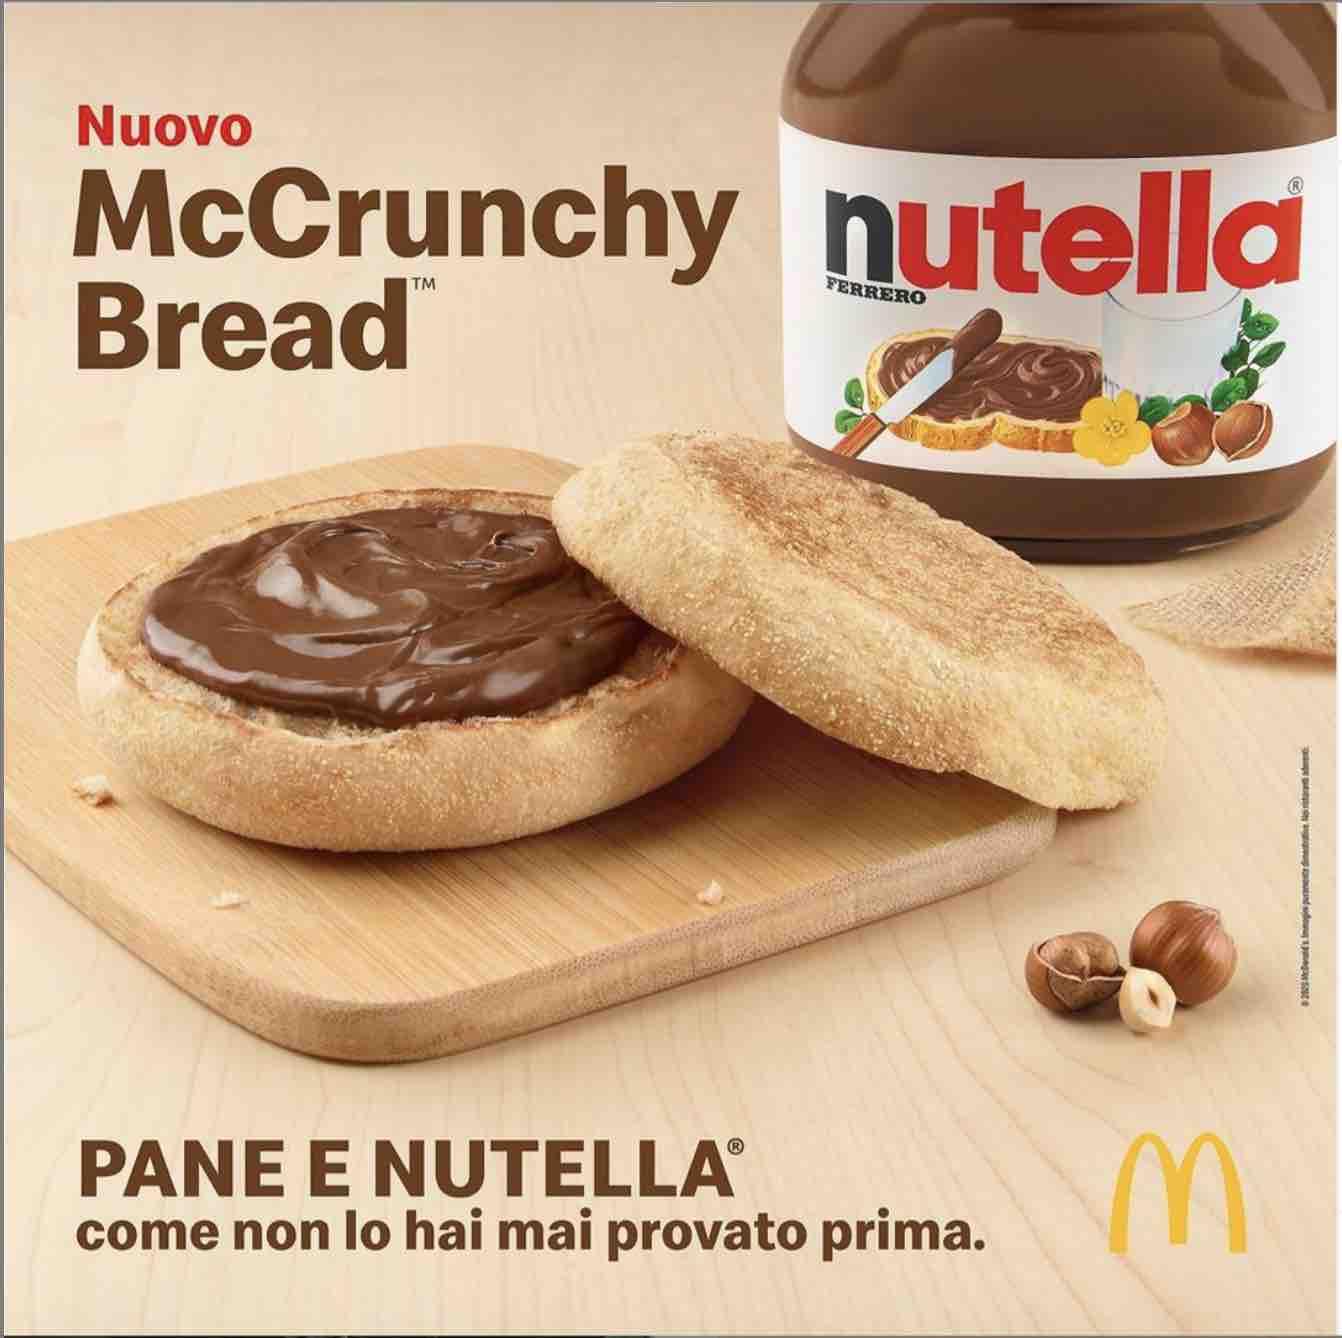 McCrunchy Bread